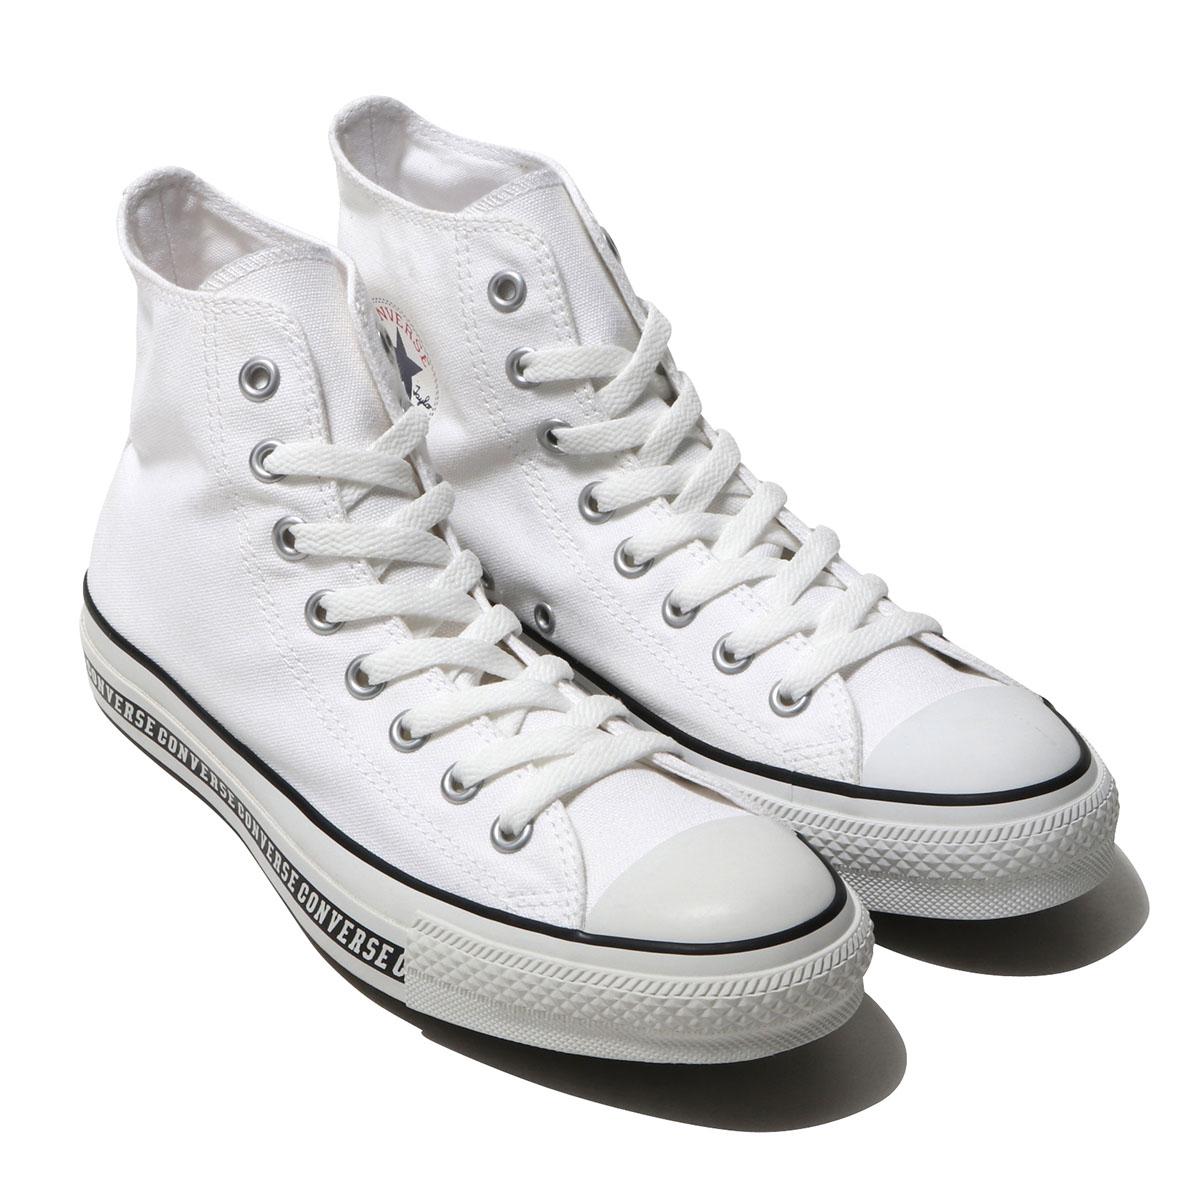 CONVERSE ALL STAR LOGOLINE HI(コンバース オールスター ロゴライン ハイ)ホワイト【メンズ レディース スニーカー】19SS-I